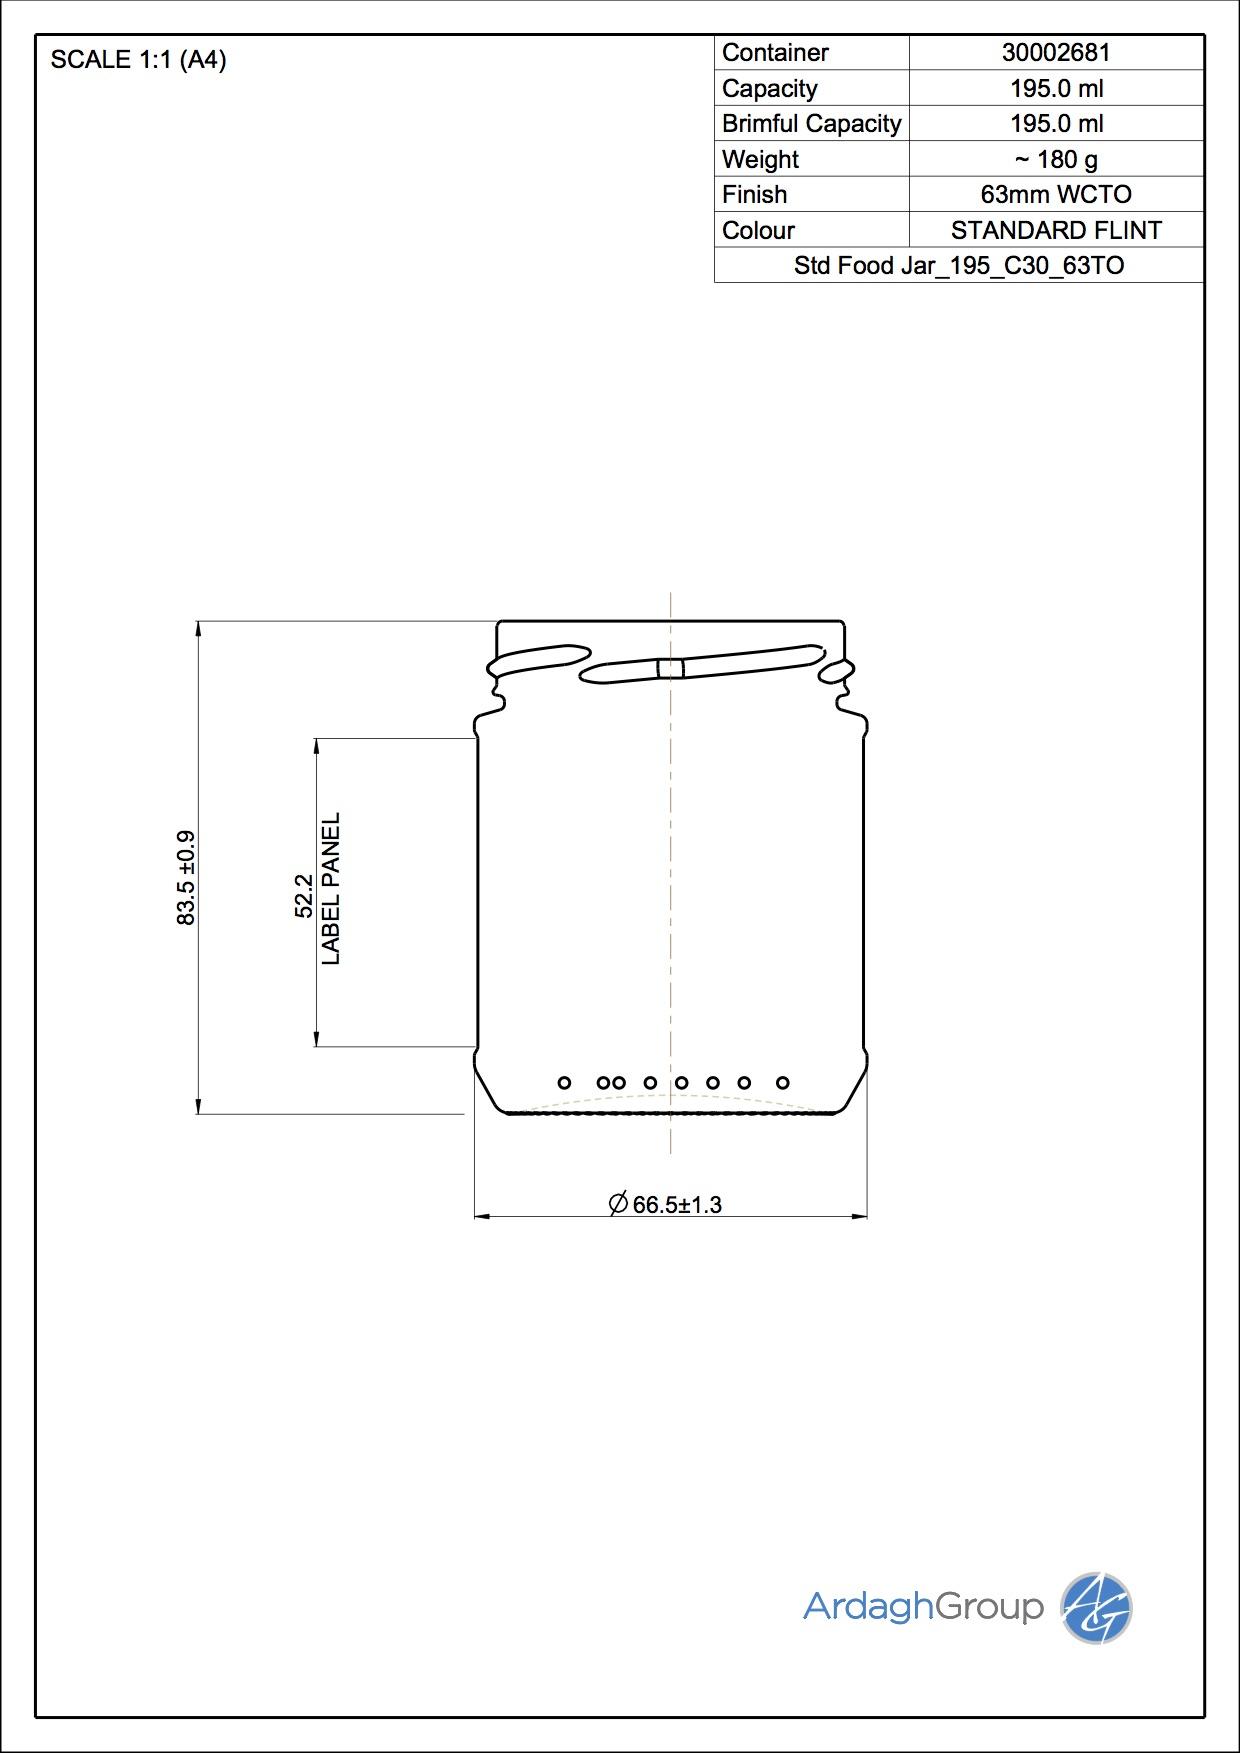 Std Food Jar 195 C30 63TO